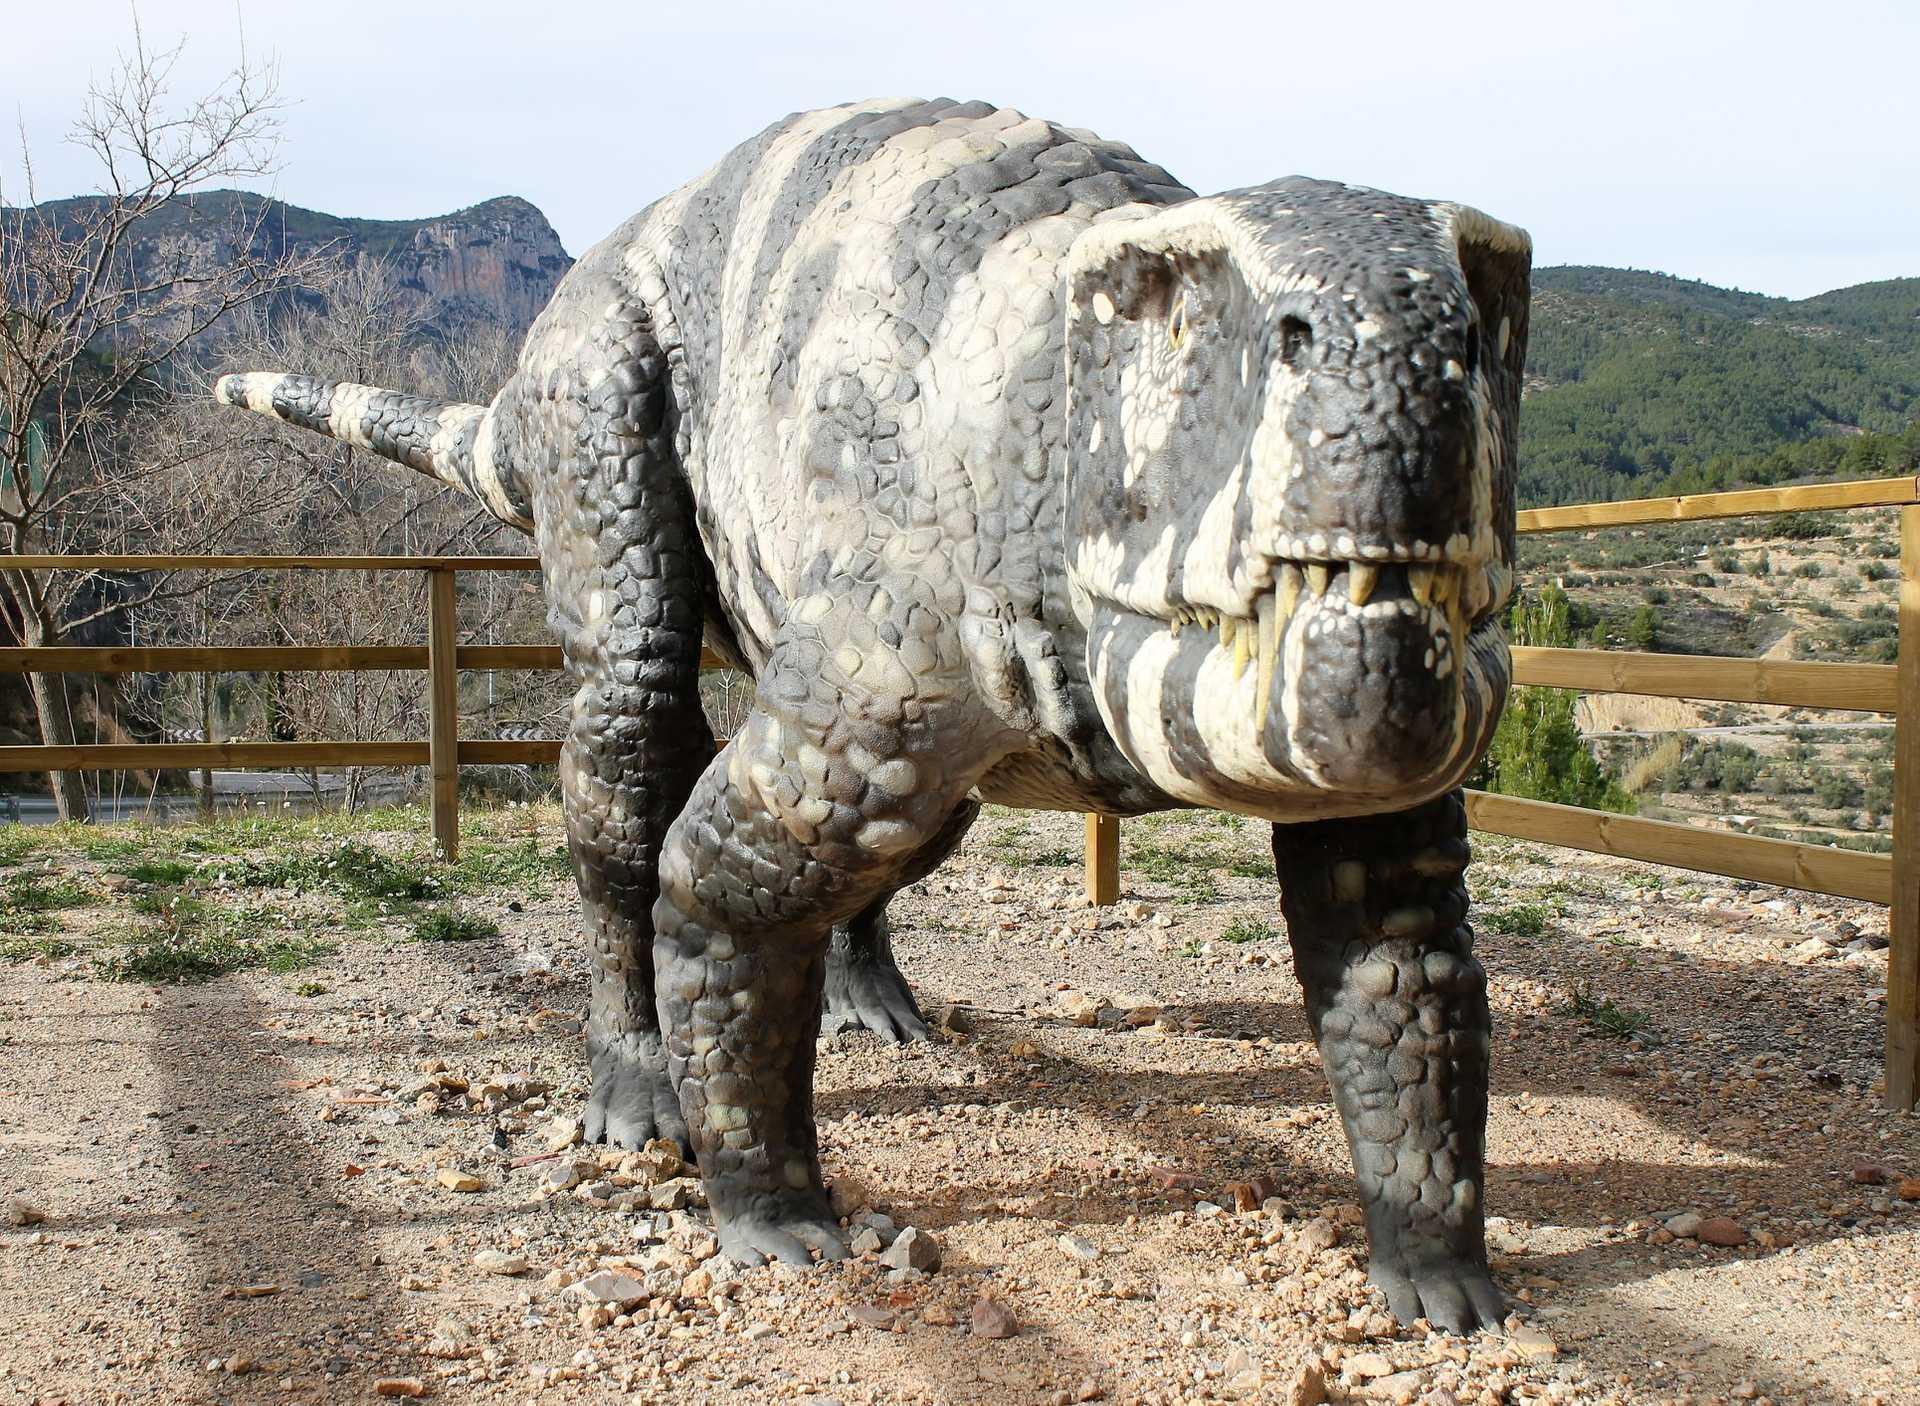 +info Camins de dinosaures